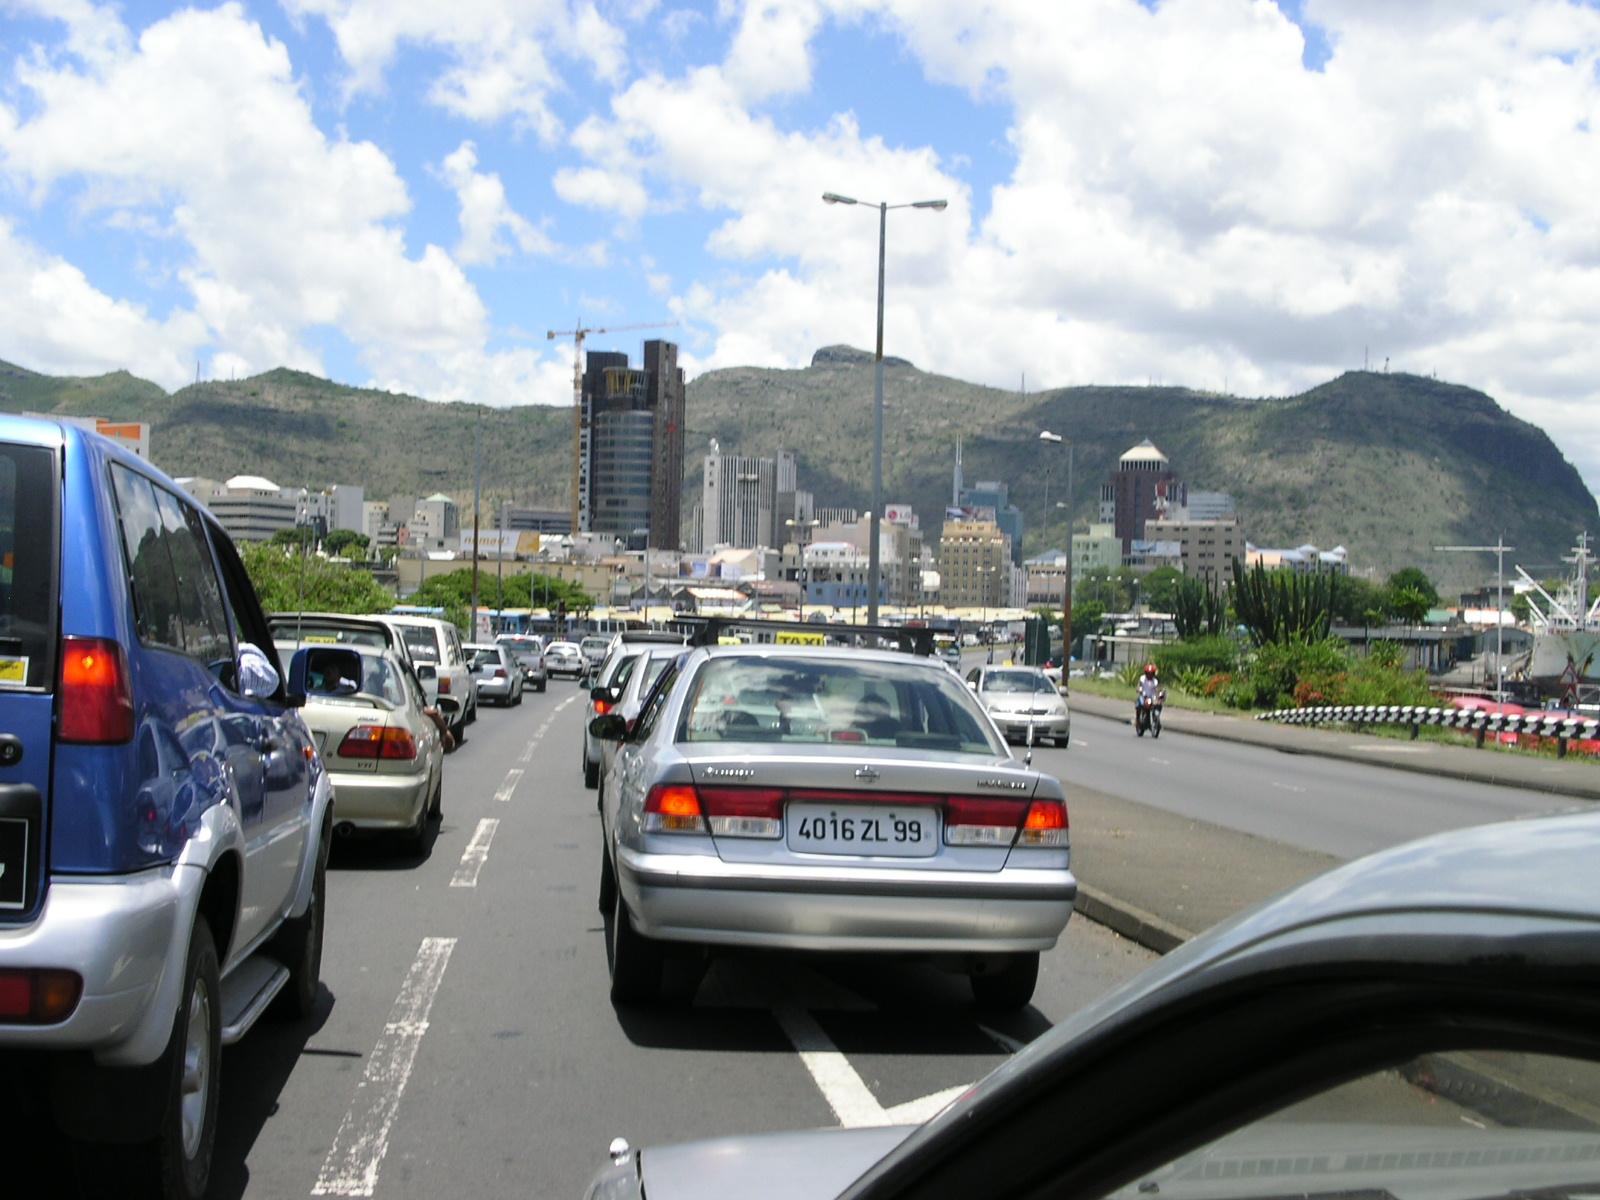 Traffic Jam >> File:Highway traffic jam, suburbs of Port Louis - panoramio.jpg - Wikimedia Commons